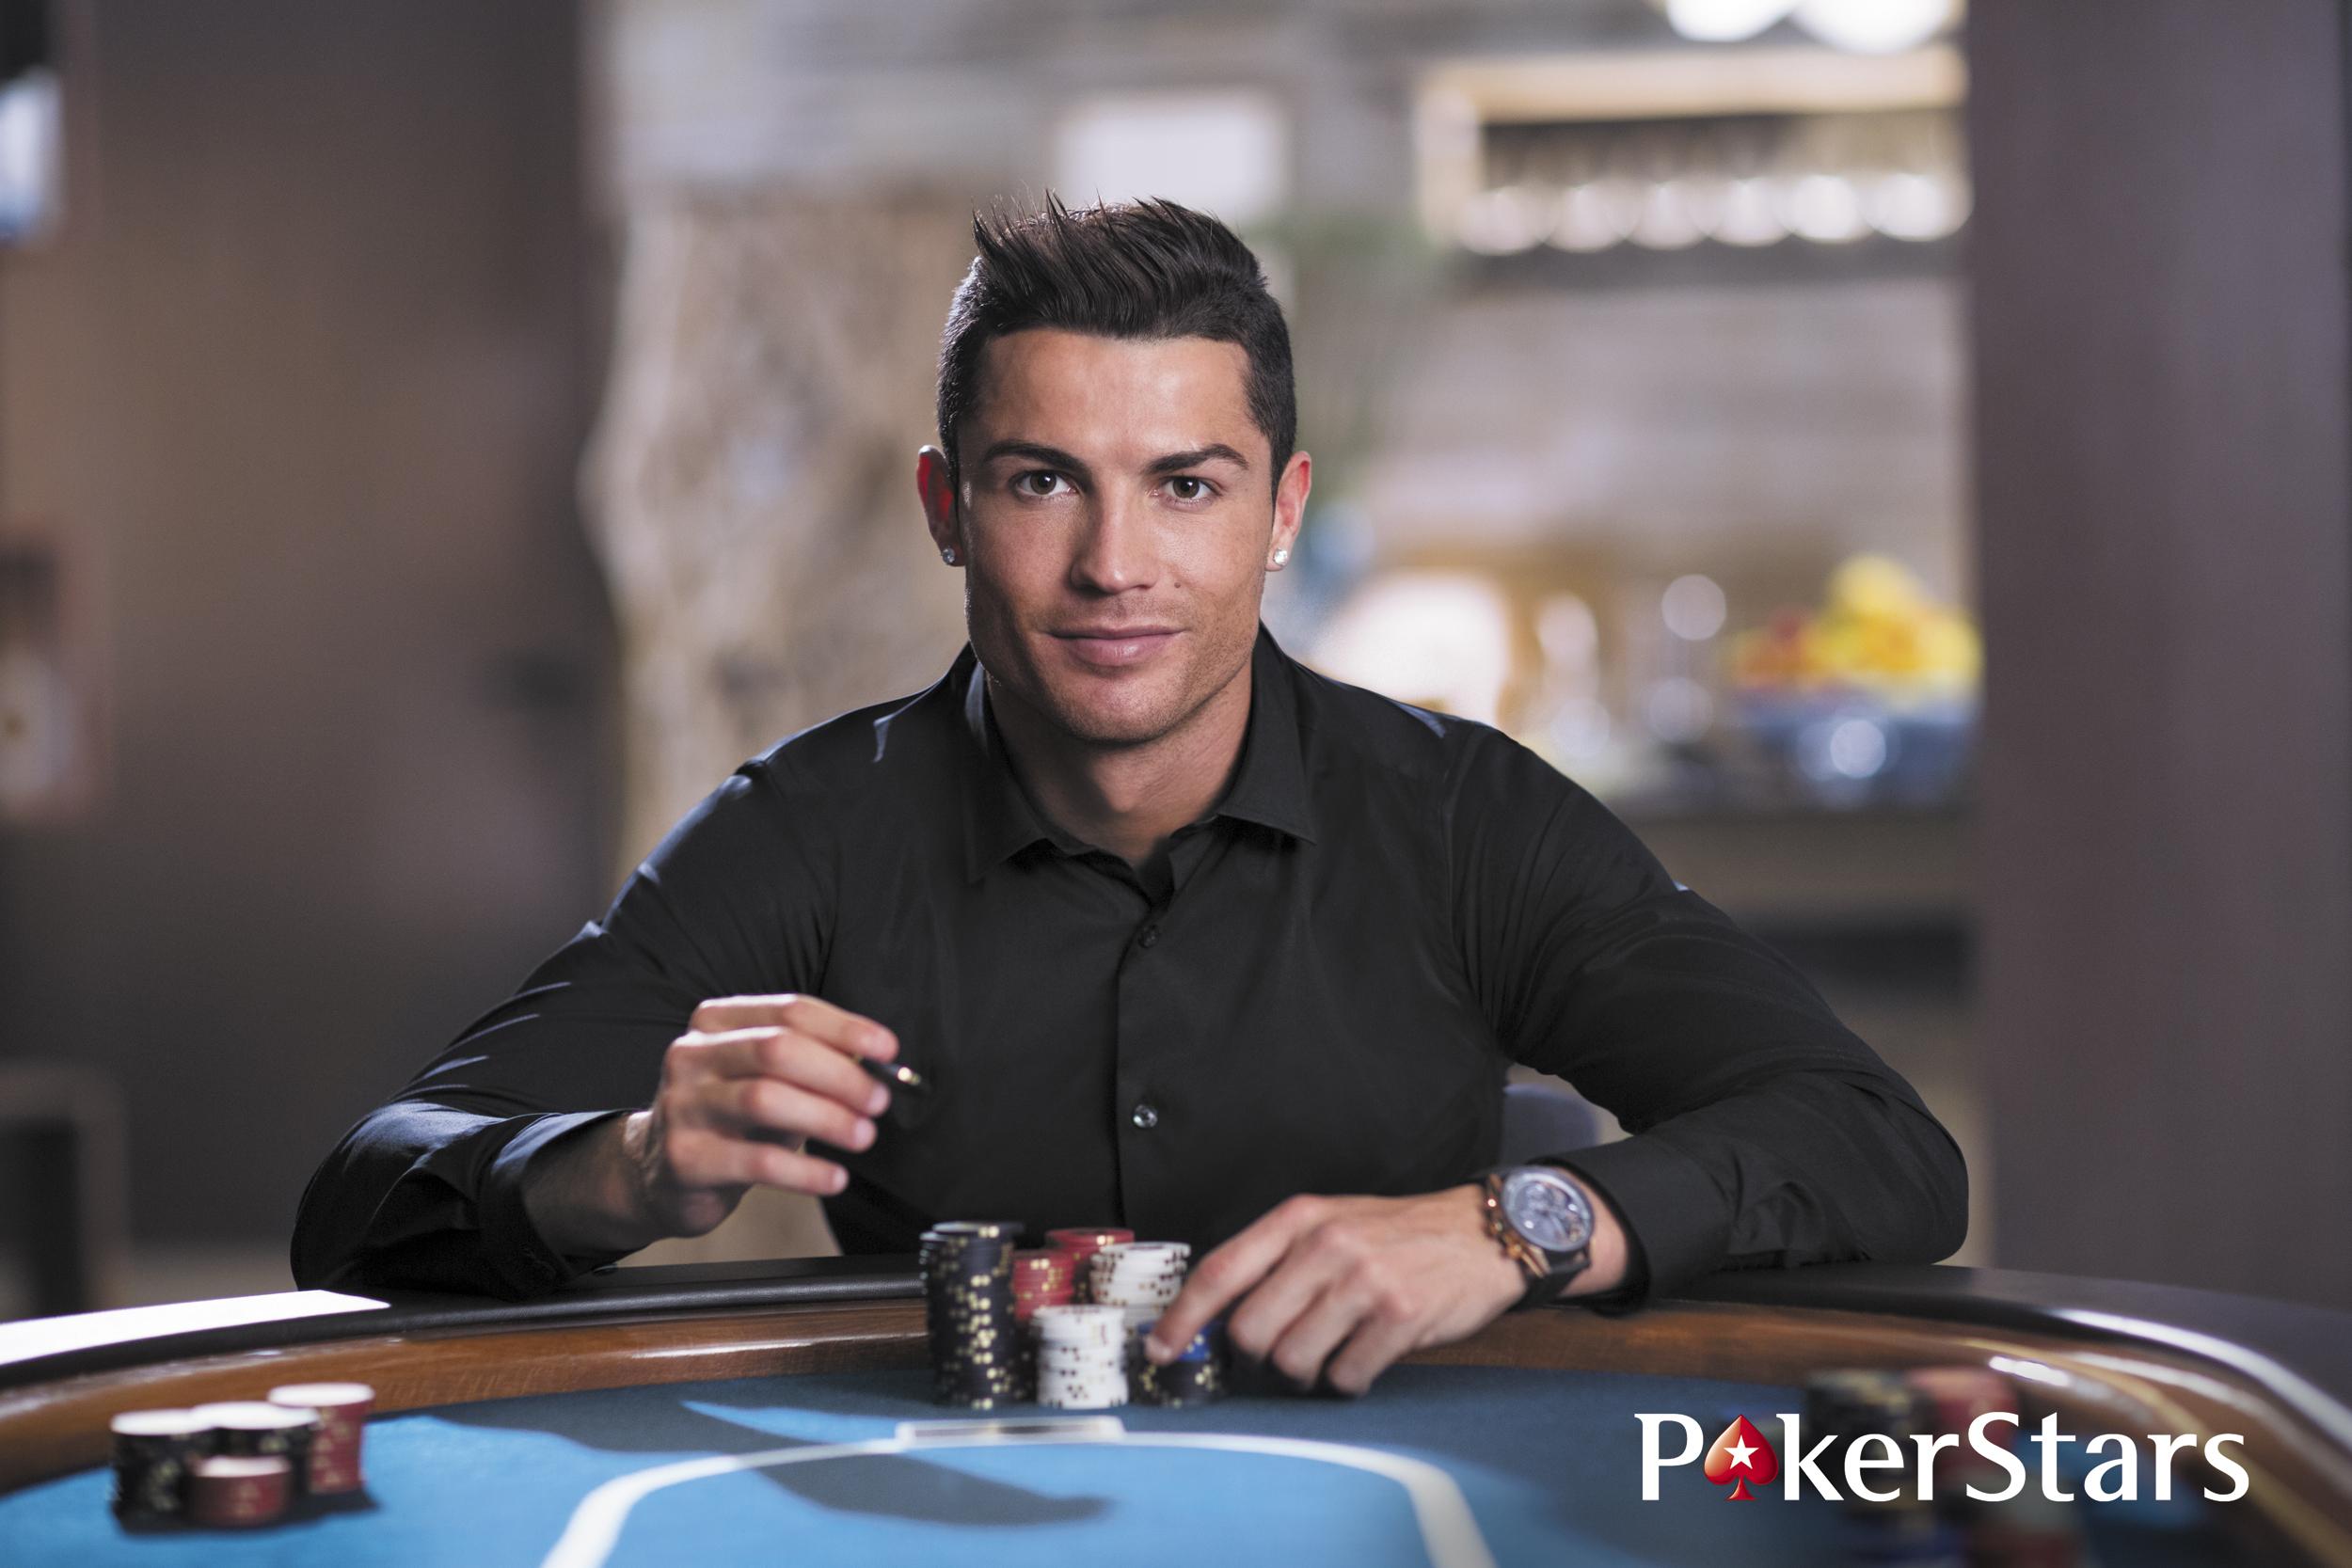 Source: PokerStars